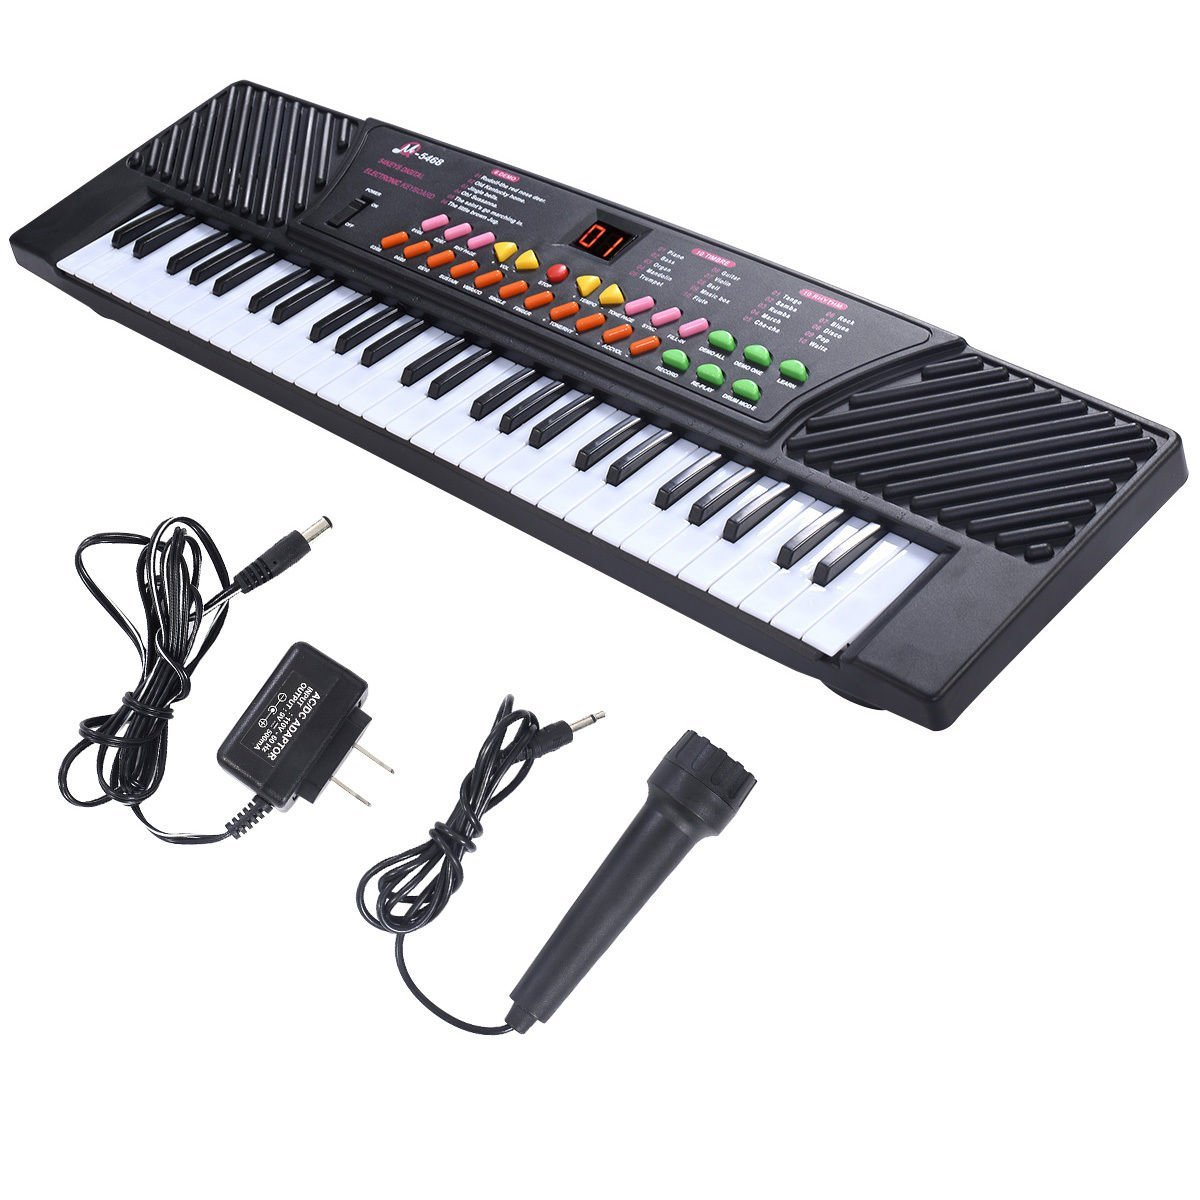 Mascarello® 54 Keys Music Electronic Keyboard Kid Electric Piano Organ W/Mic & Adapter by Mascarello (Image #8)